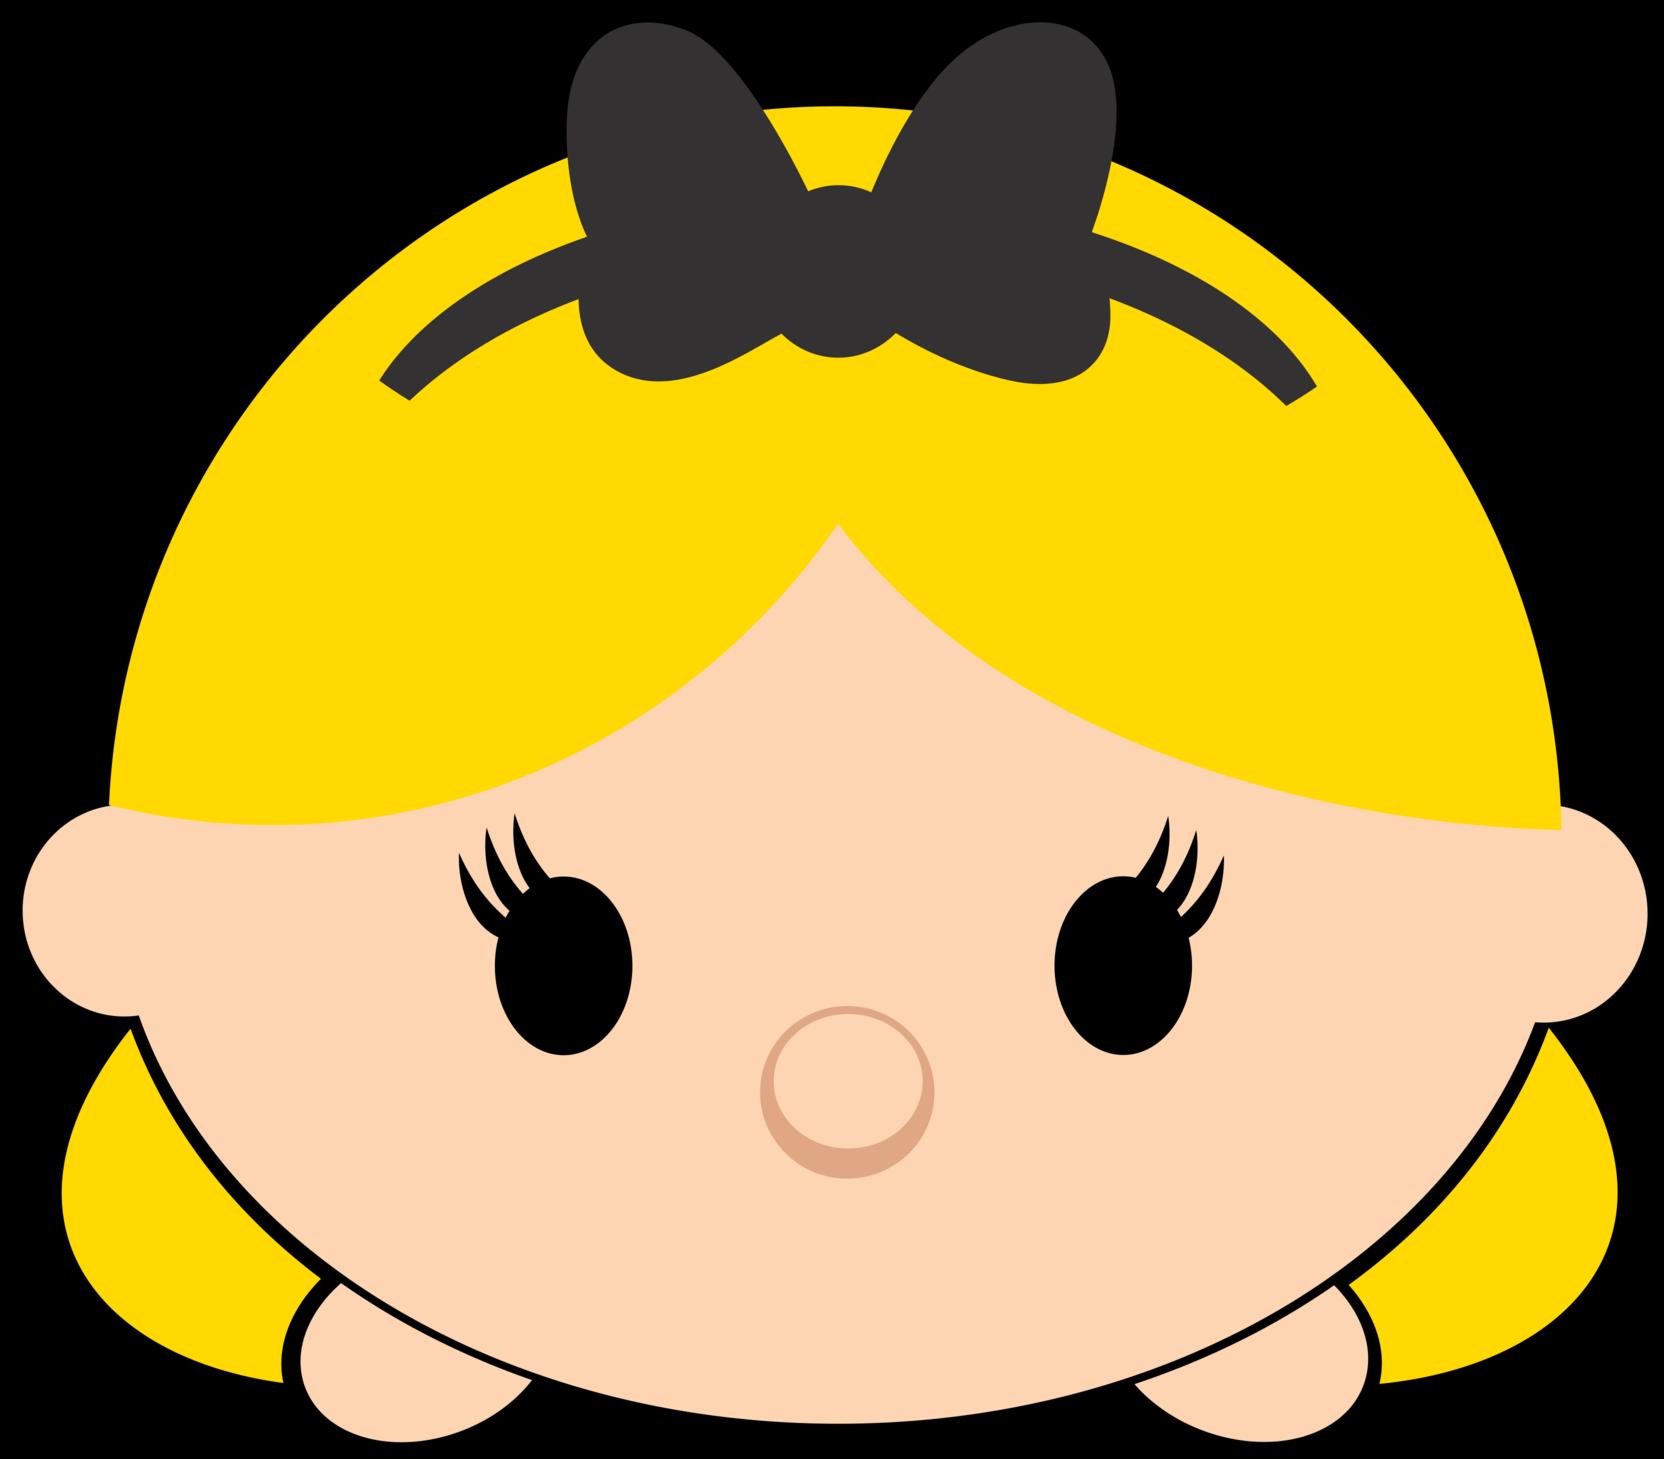 Disney Tsum Tsum Clipart Princess Aurora